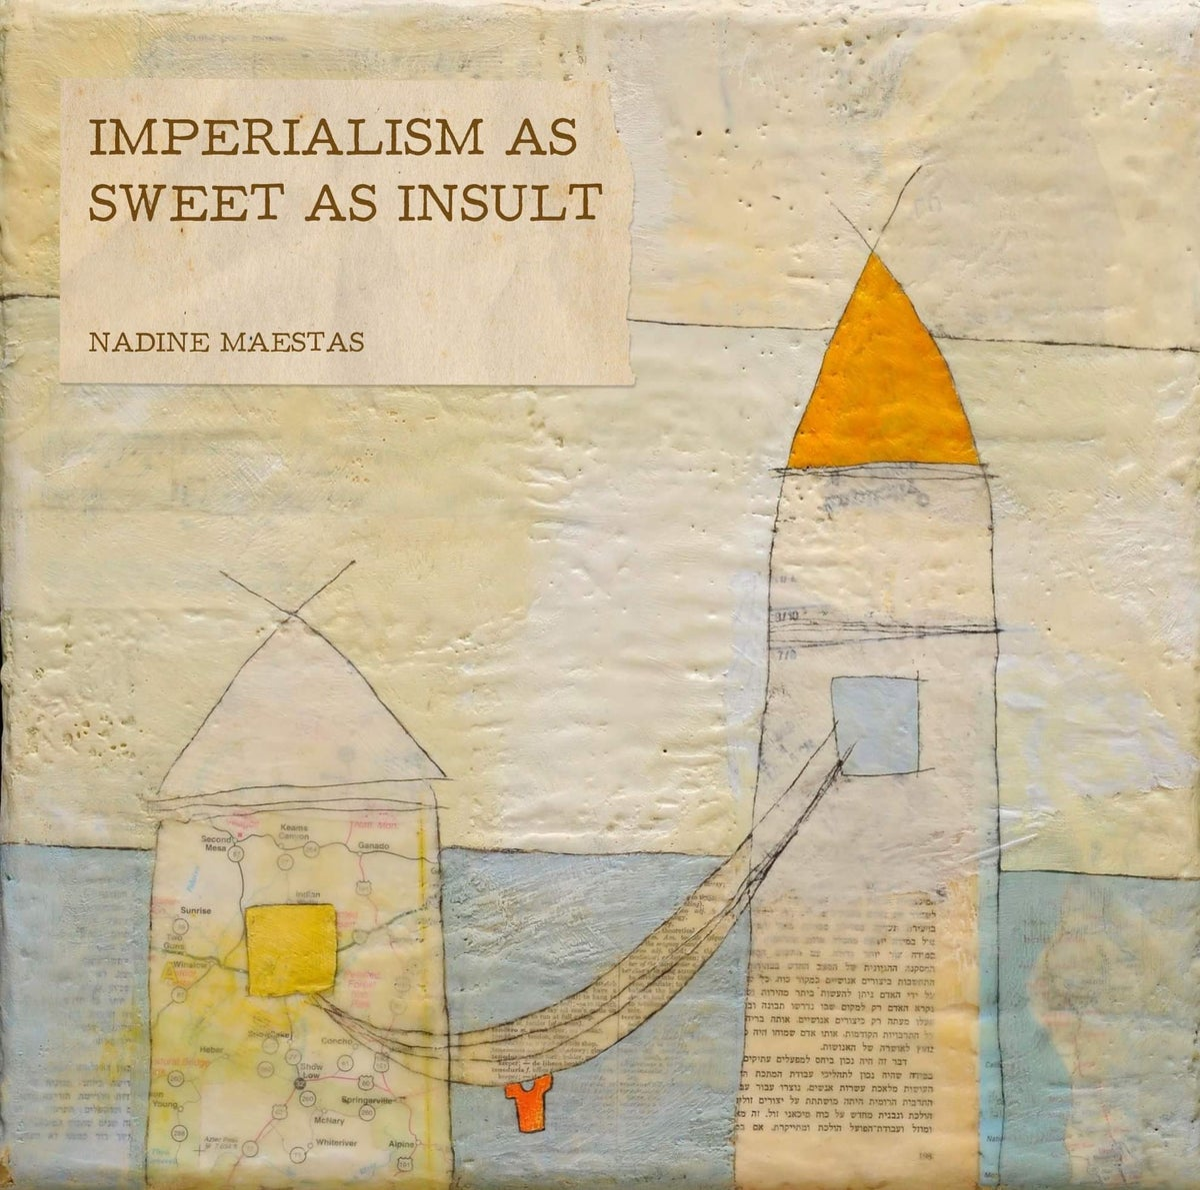 IMPERIALISM AS SWEET AS INSULT - Nadine Maestas